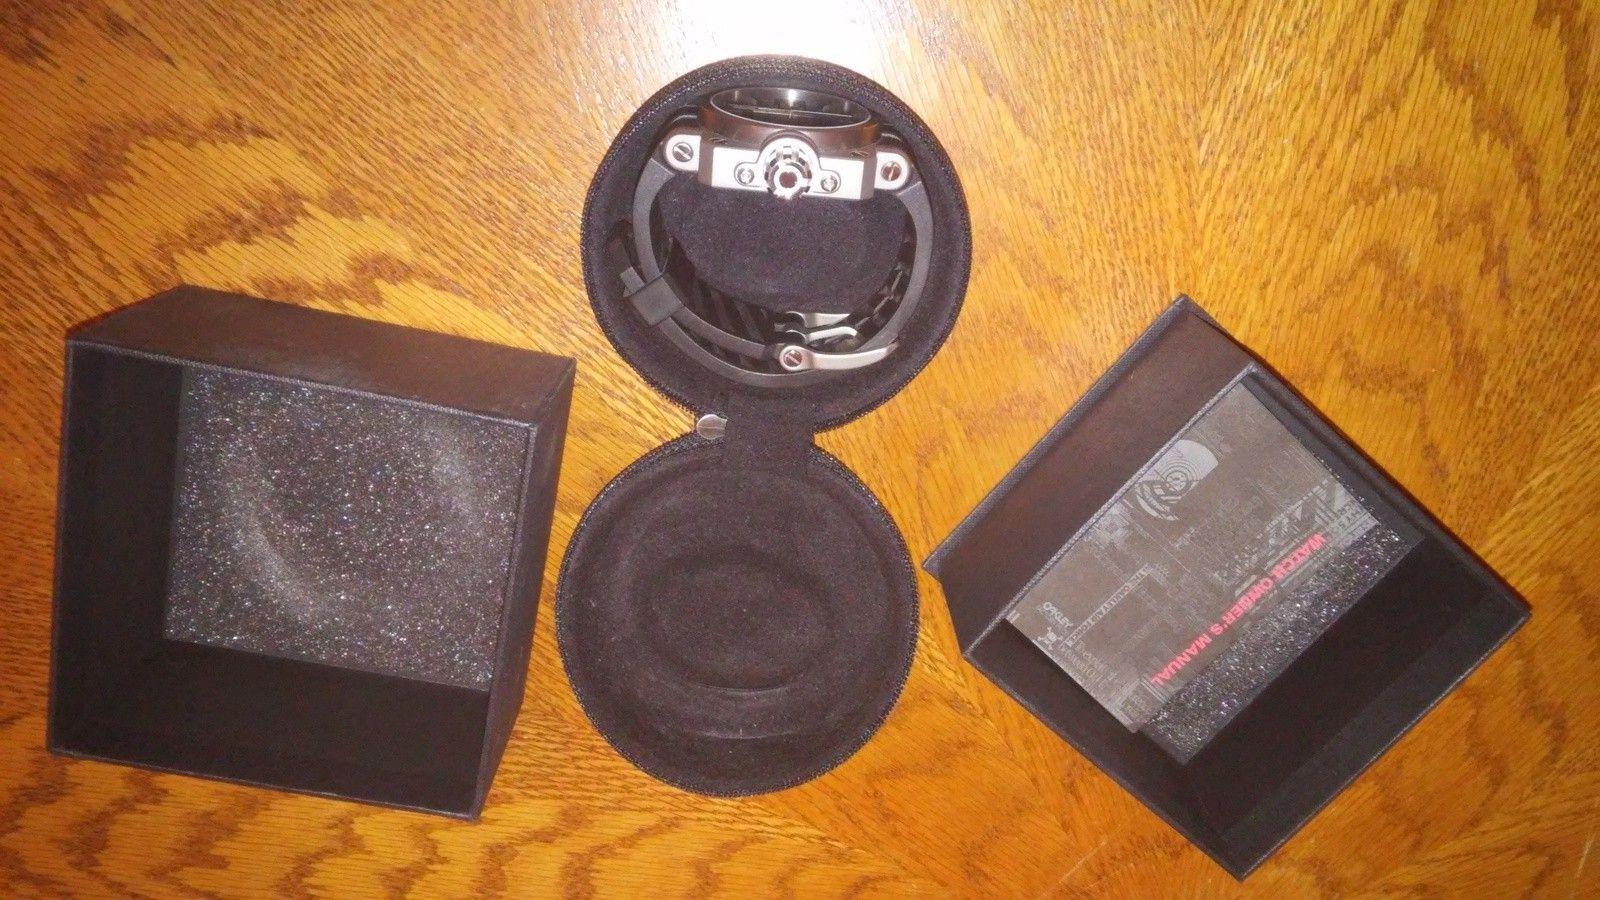 Gearbox ti/carbon fiber - 20150406_091138.jpg